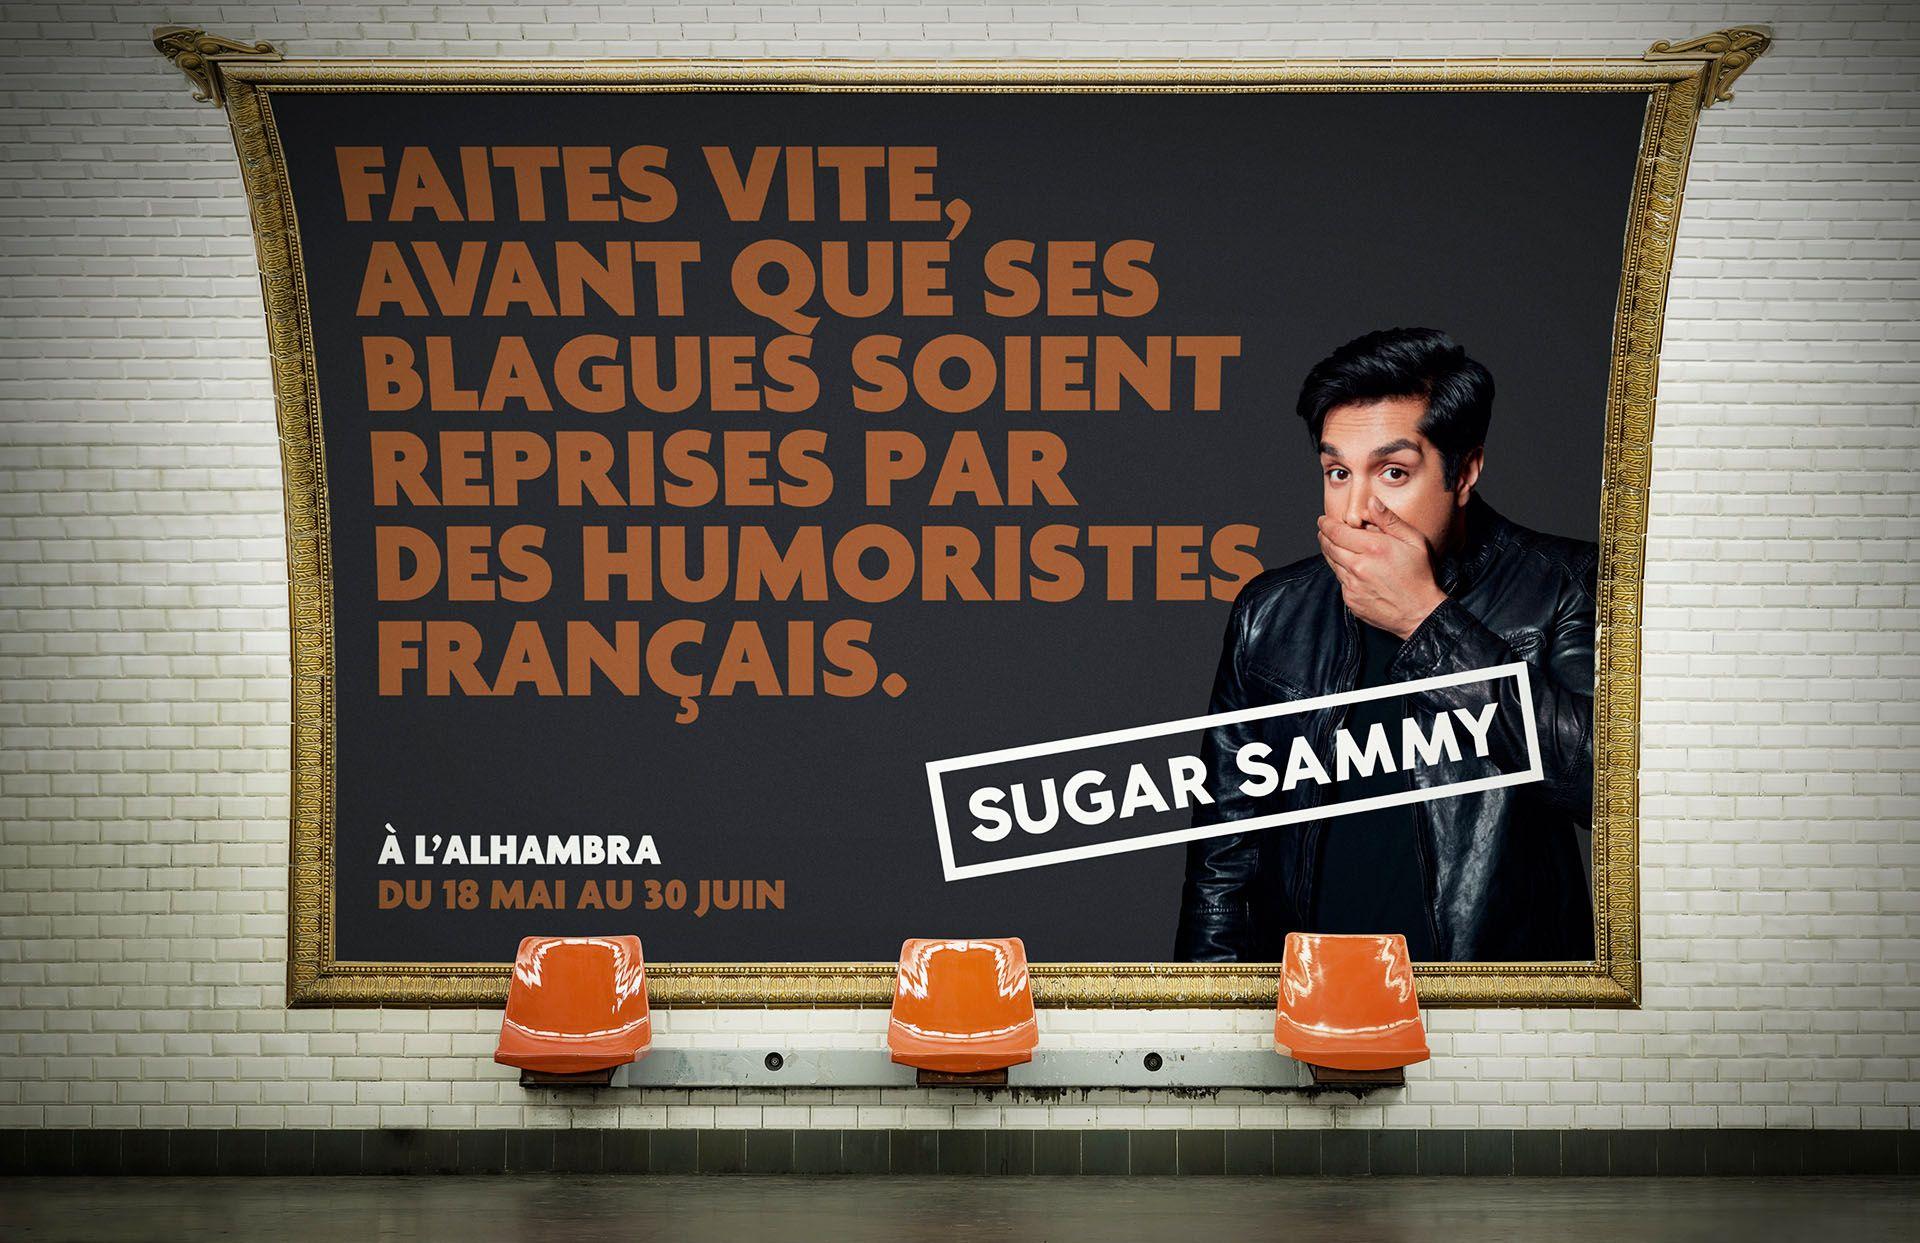 mockup of humorist Sugar Sammy show ad in metro